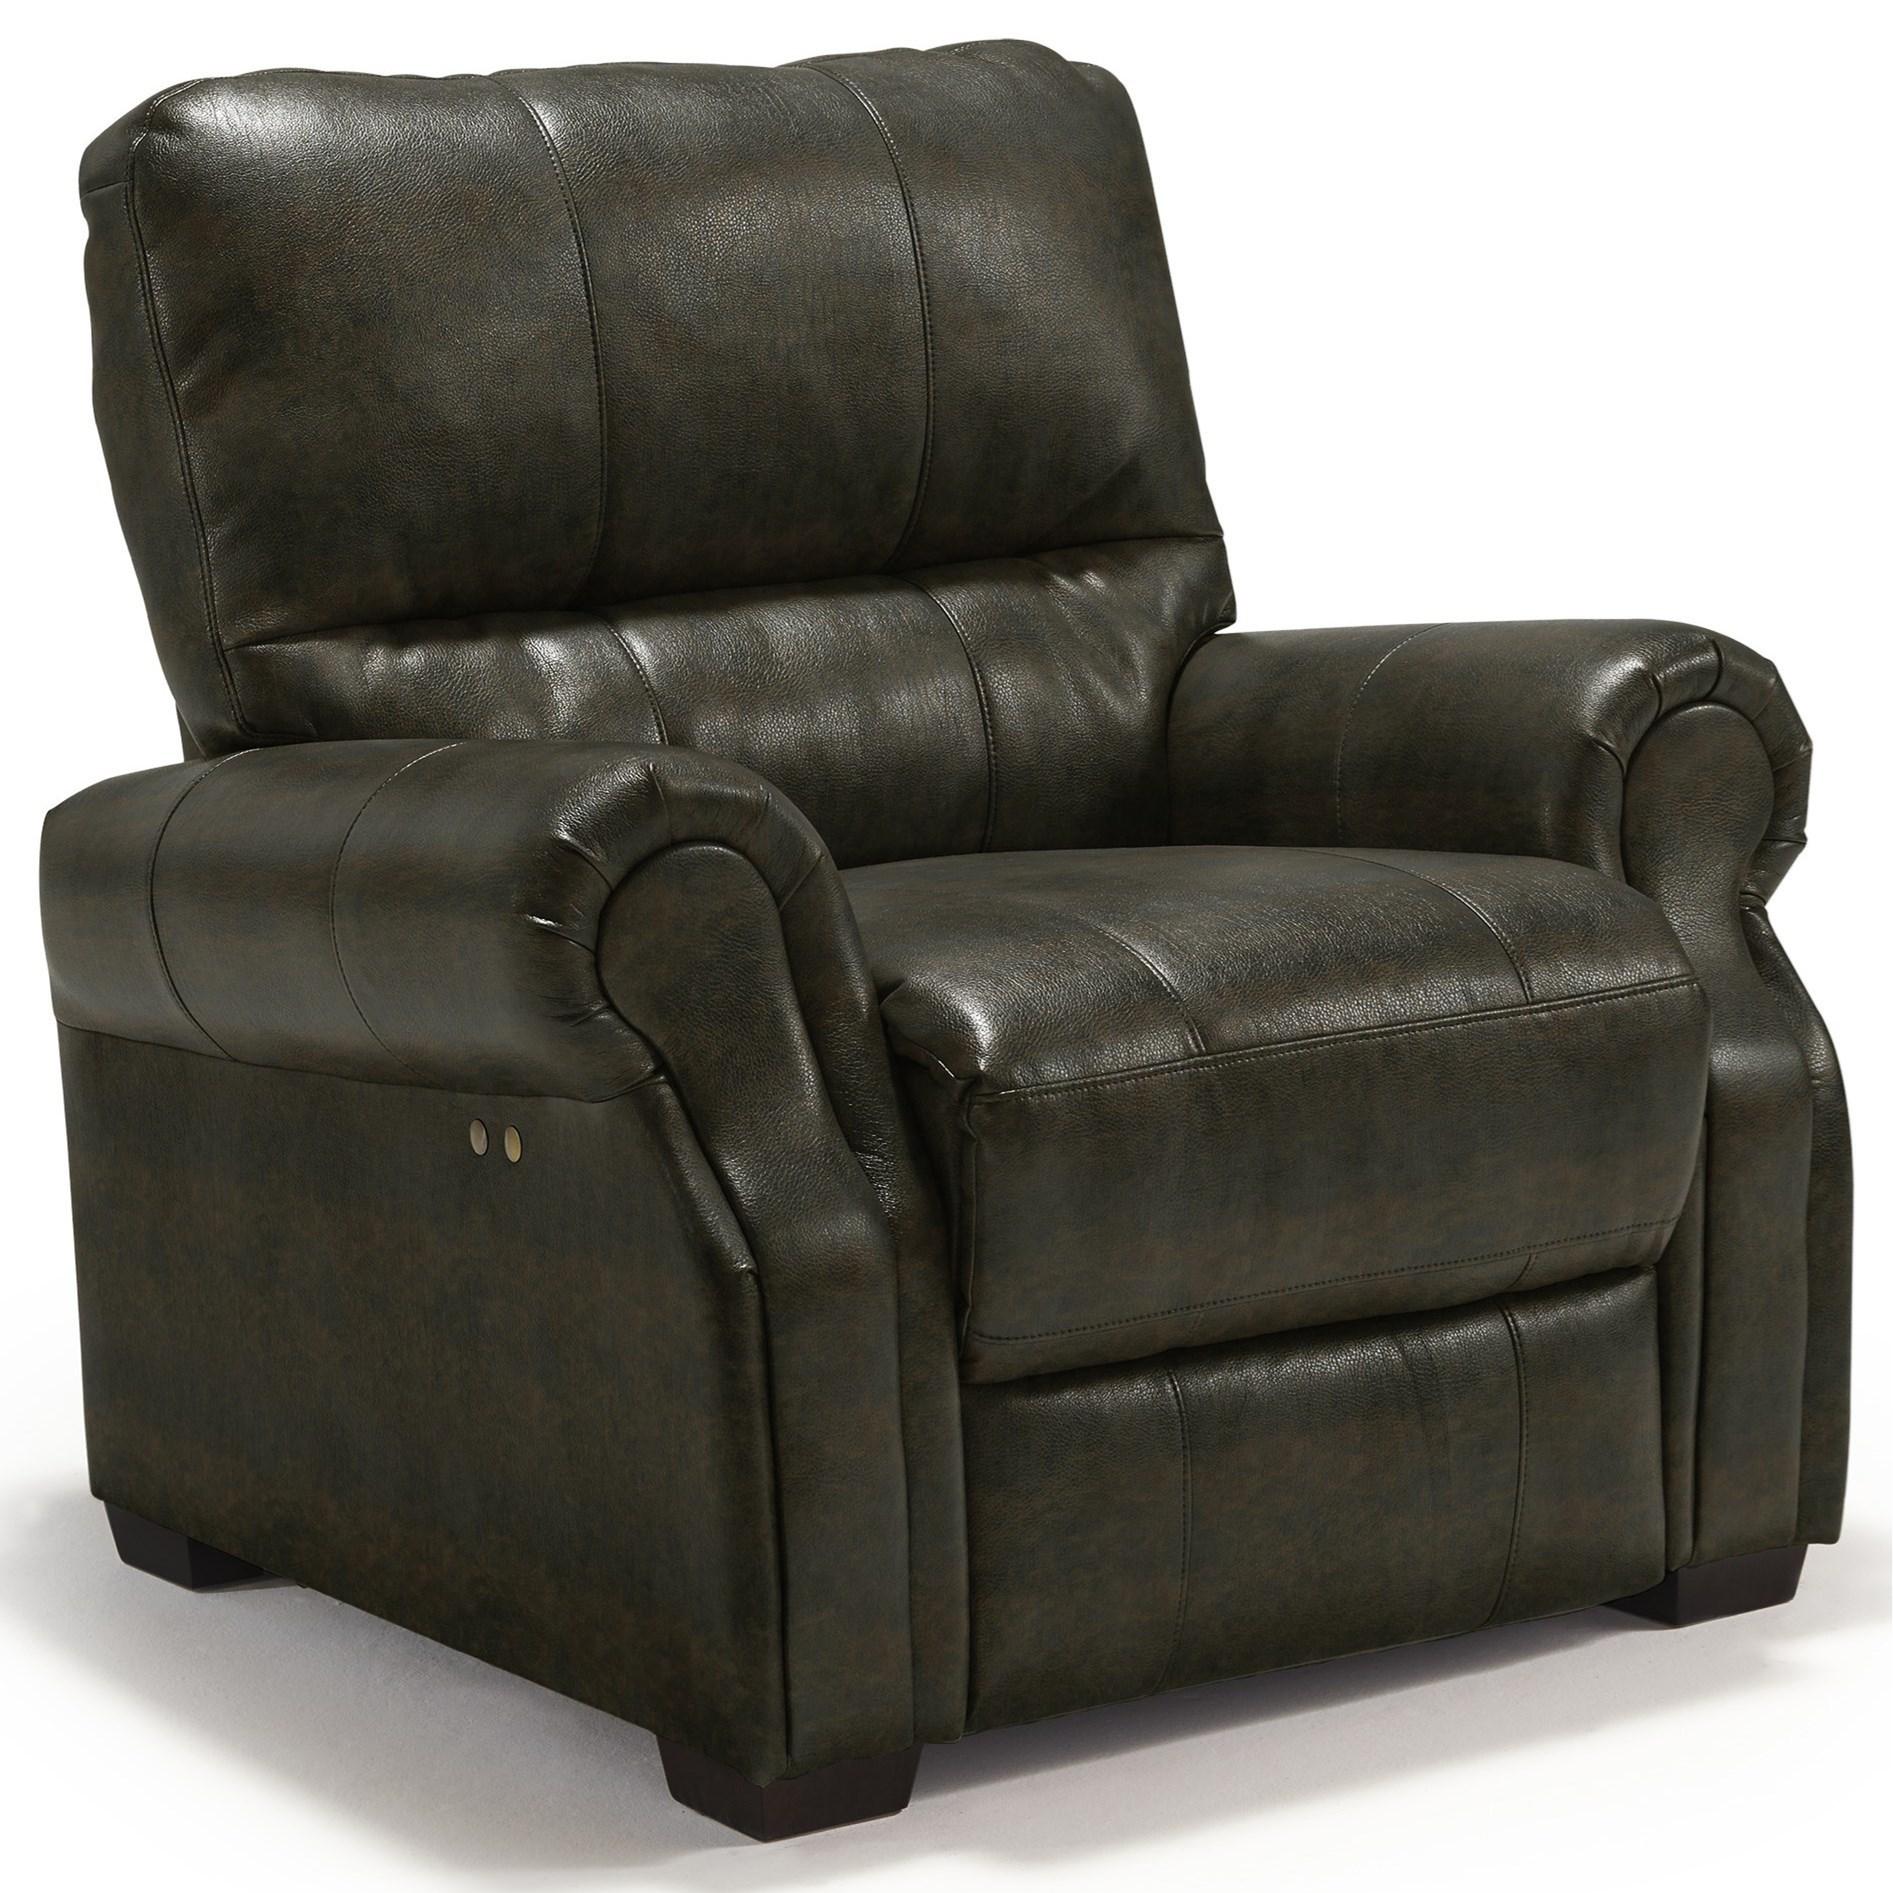 Best Home Furnishings Damien Power High Leg Recliner - Item Number: 2003483532-24783U